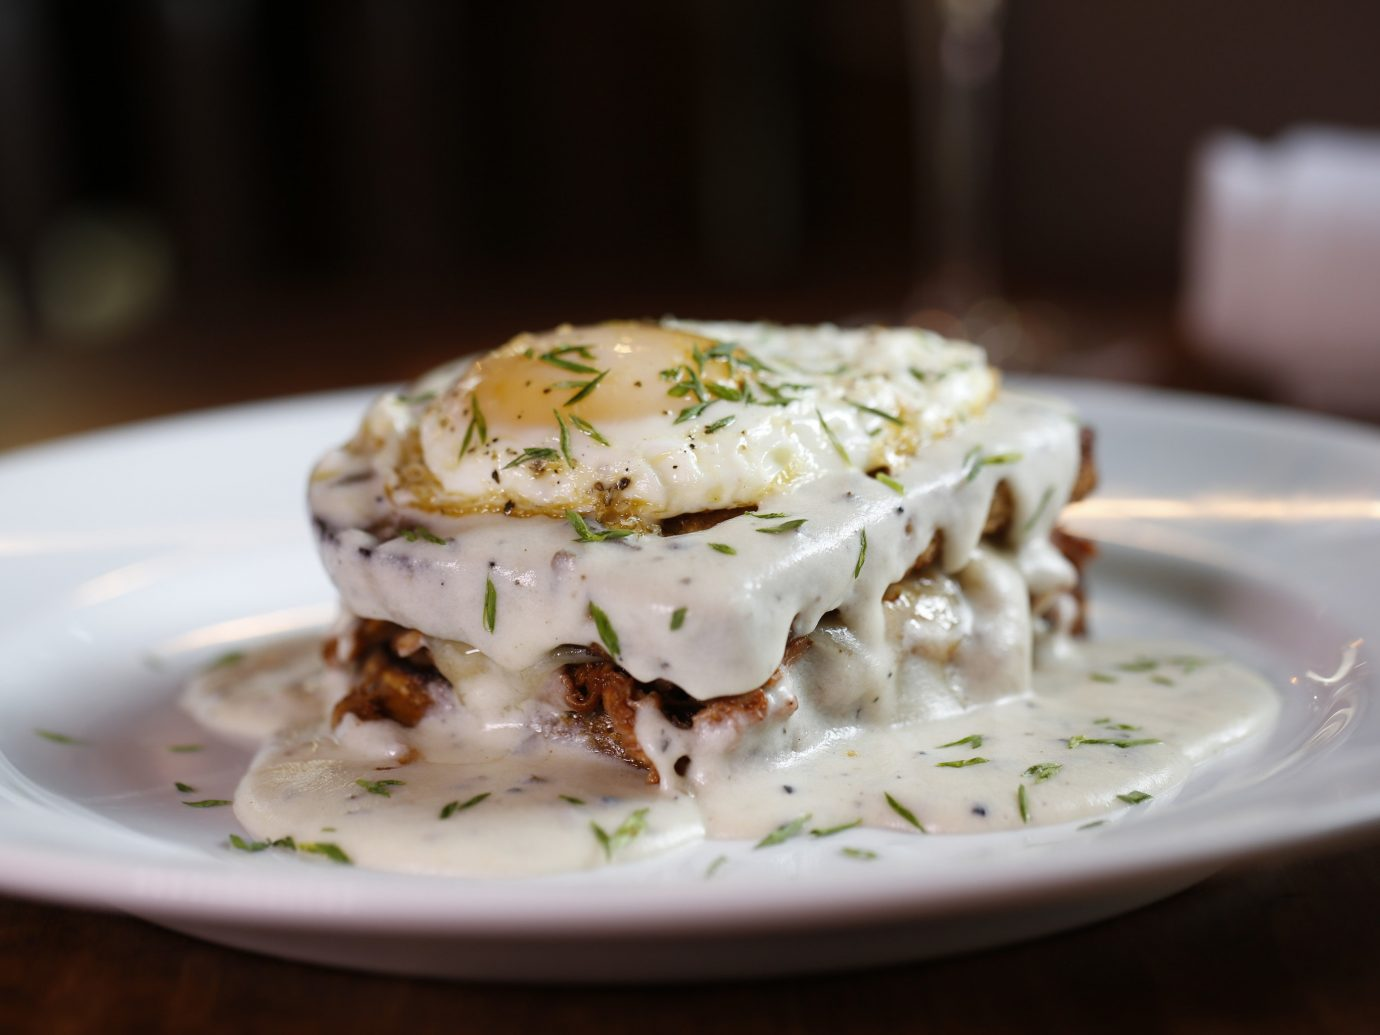 Trip Ideas plate food table indoor dish white meal cuisine breakfast produce vegetable